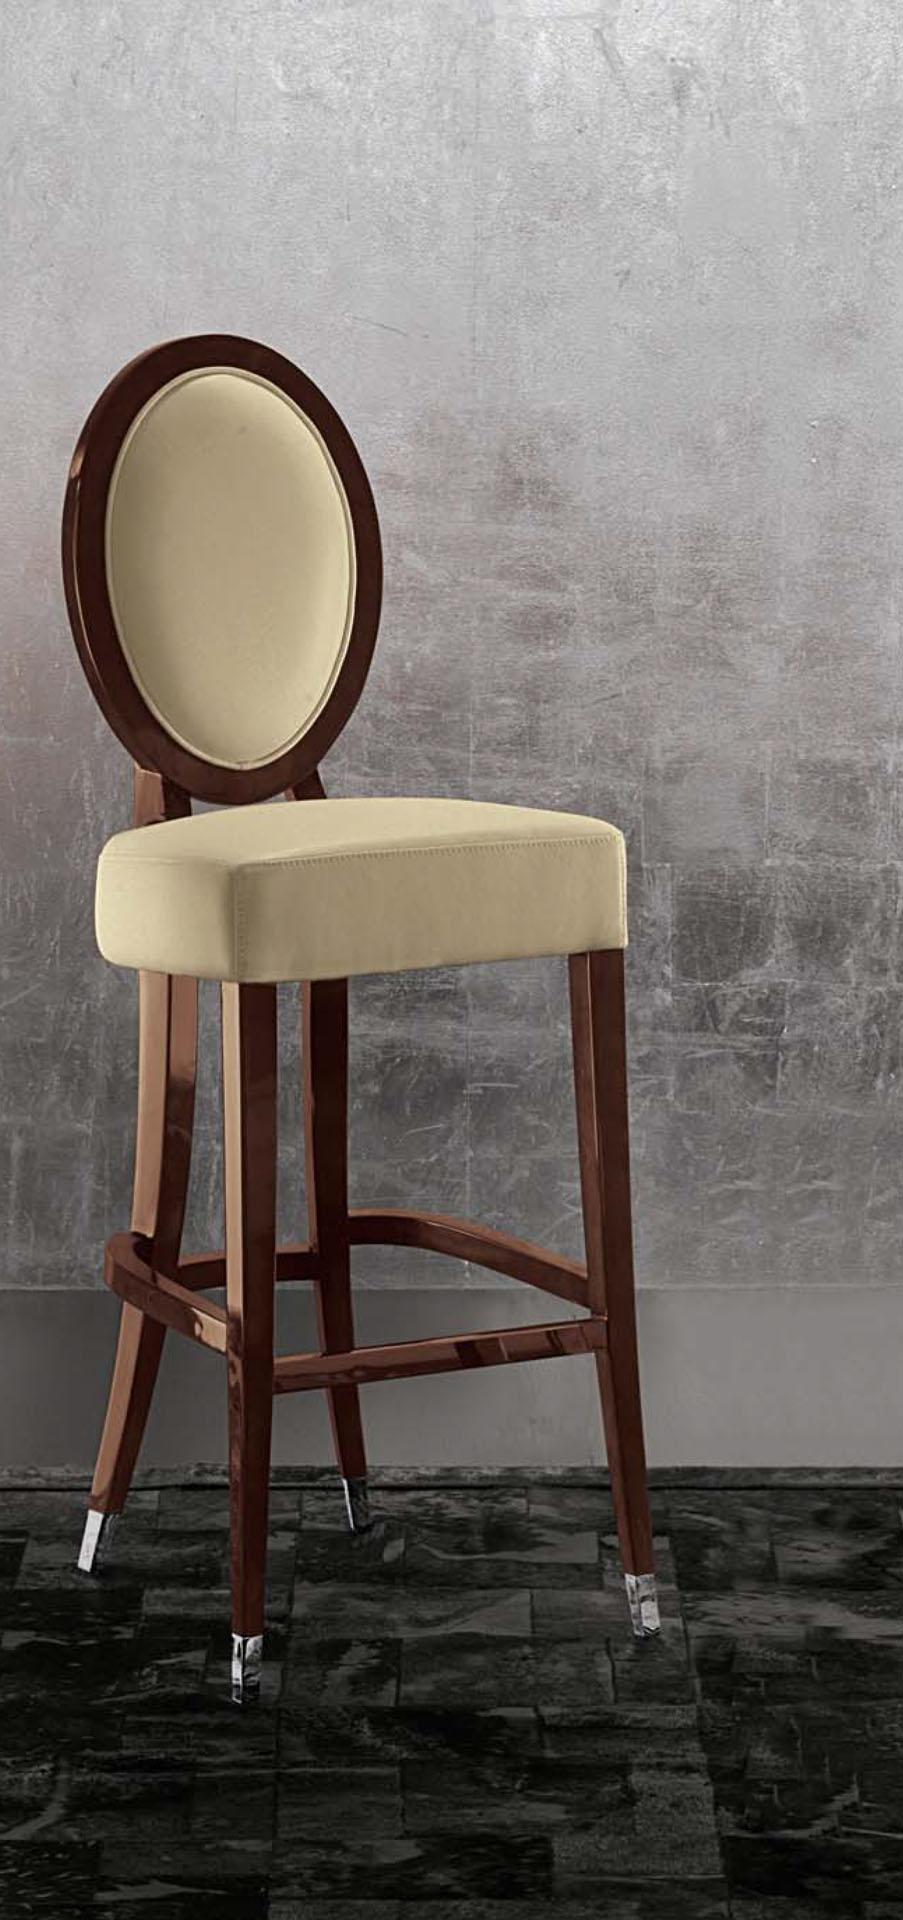 Swell Luna Bar Chair Download Free Architecture Designs Rallybritishbridgeorg